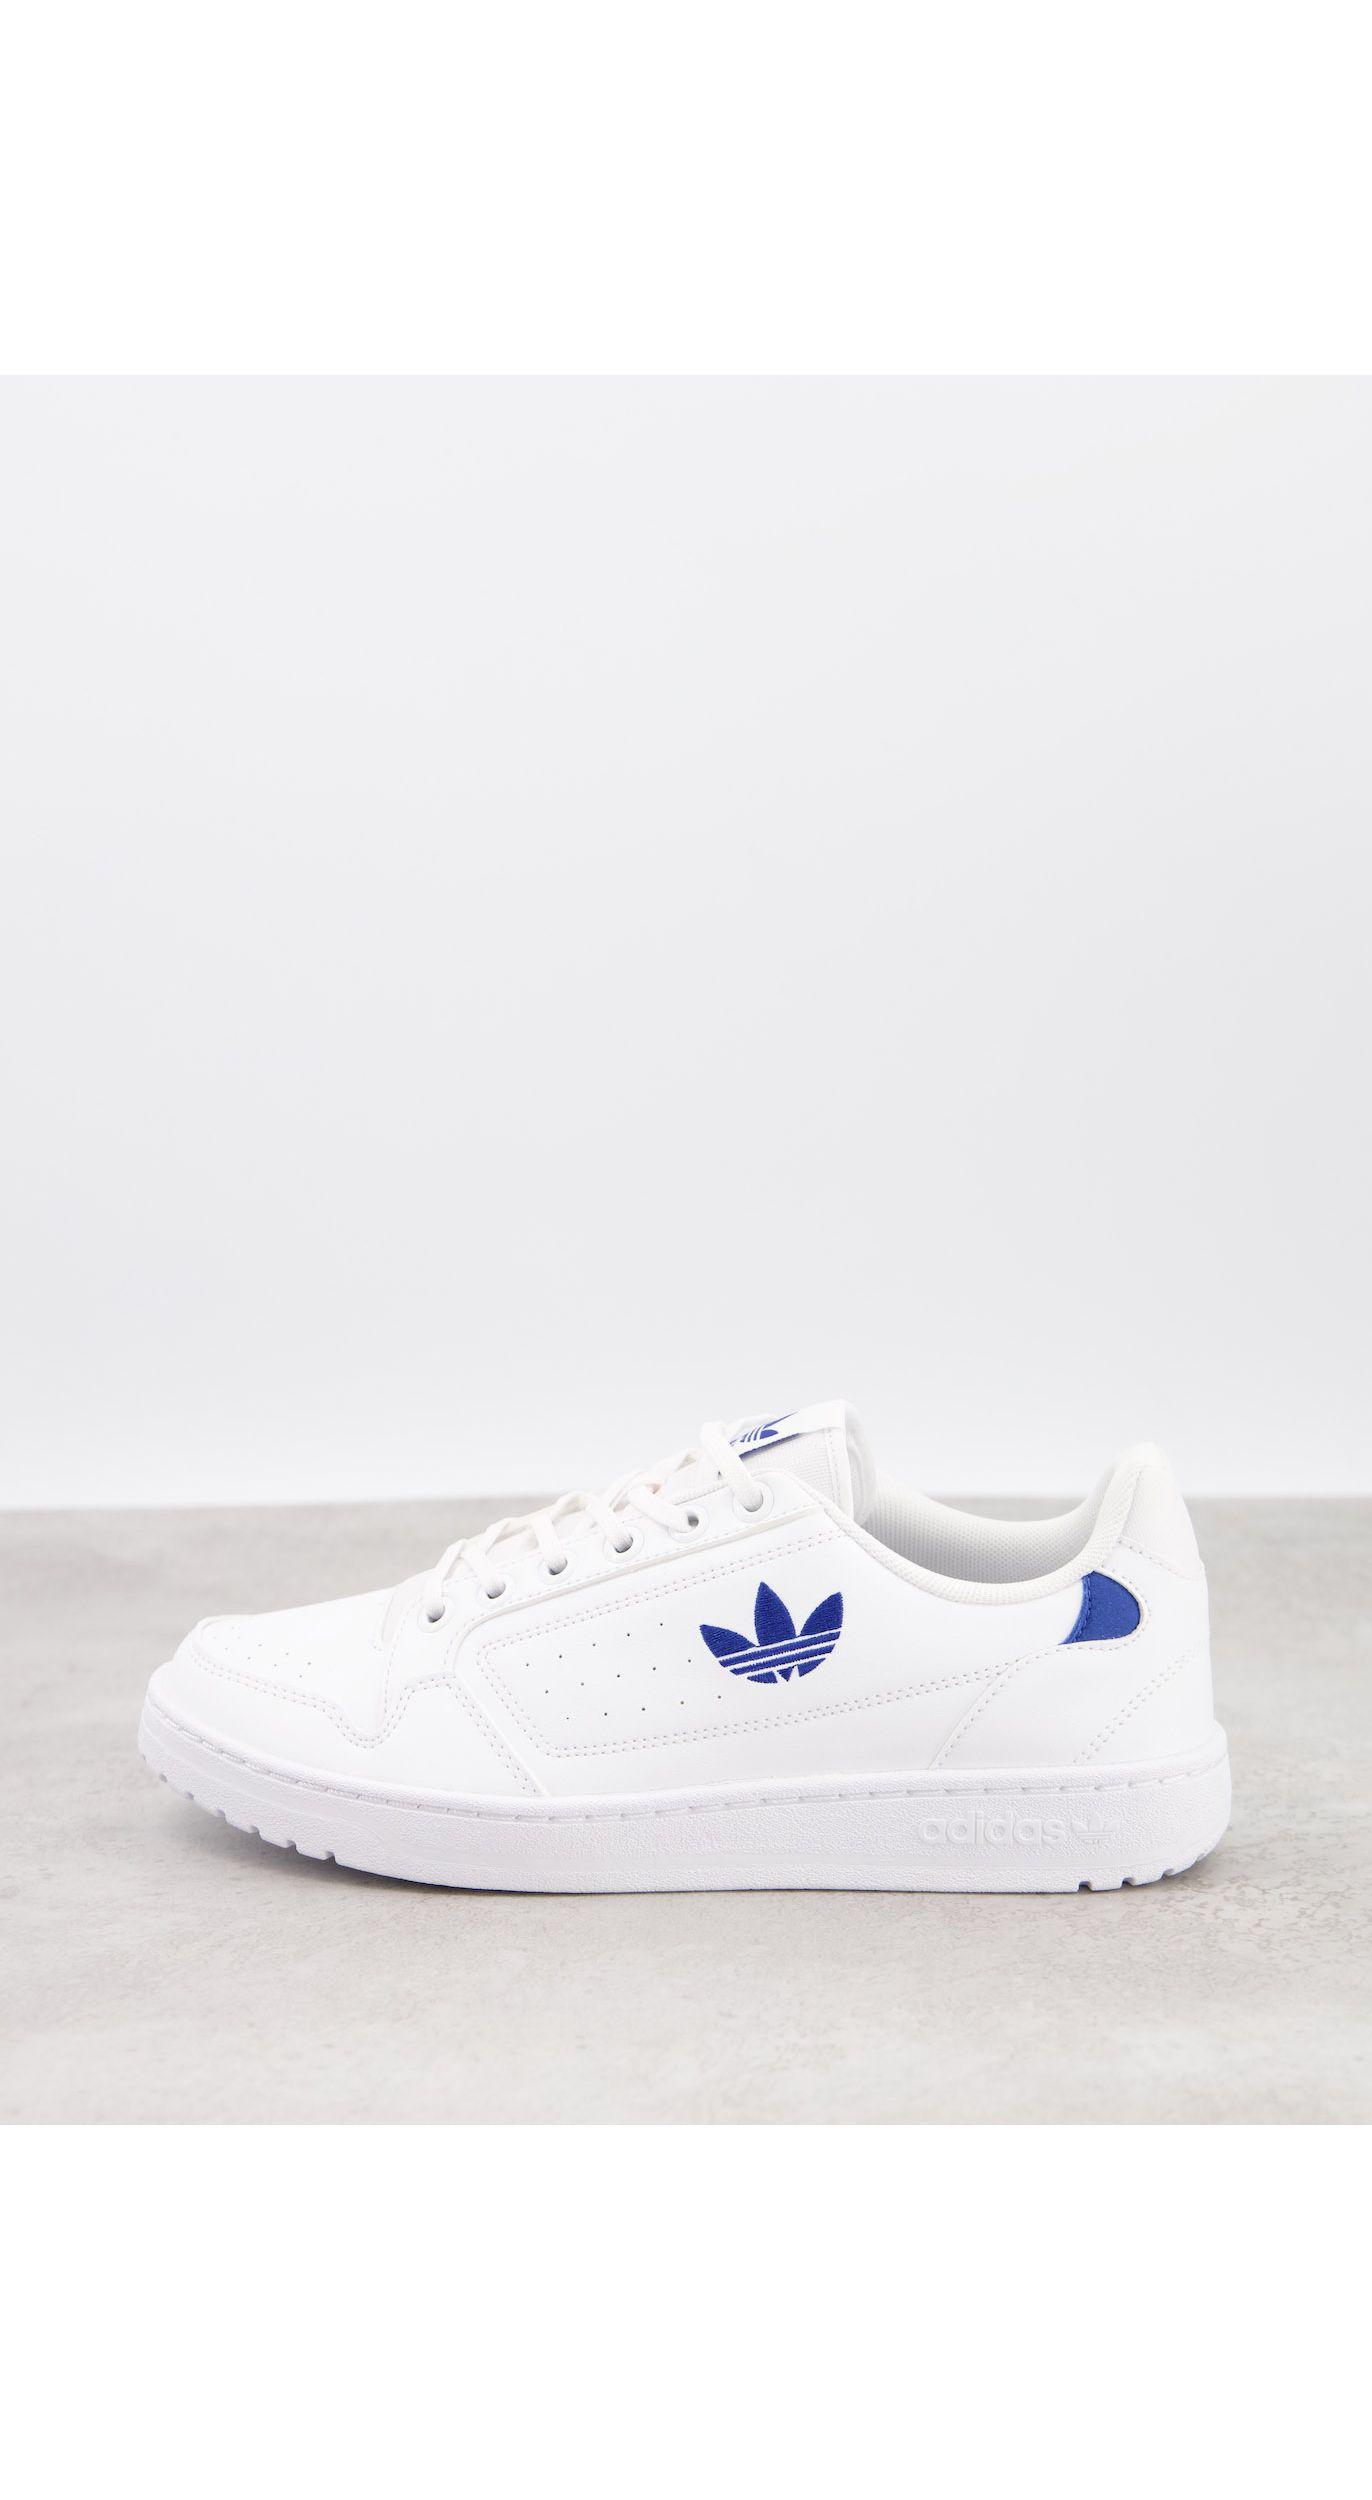 NY 92 - Baskets à logo bleu Caoutchouc adidas Originals pour homme ...